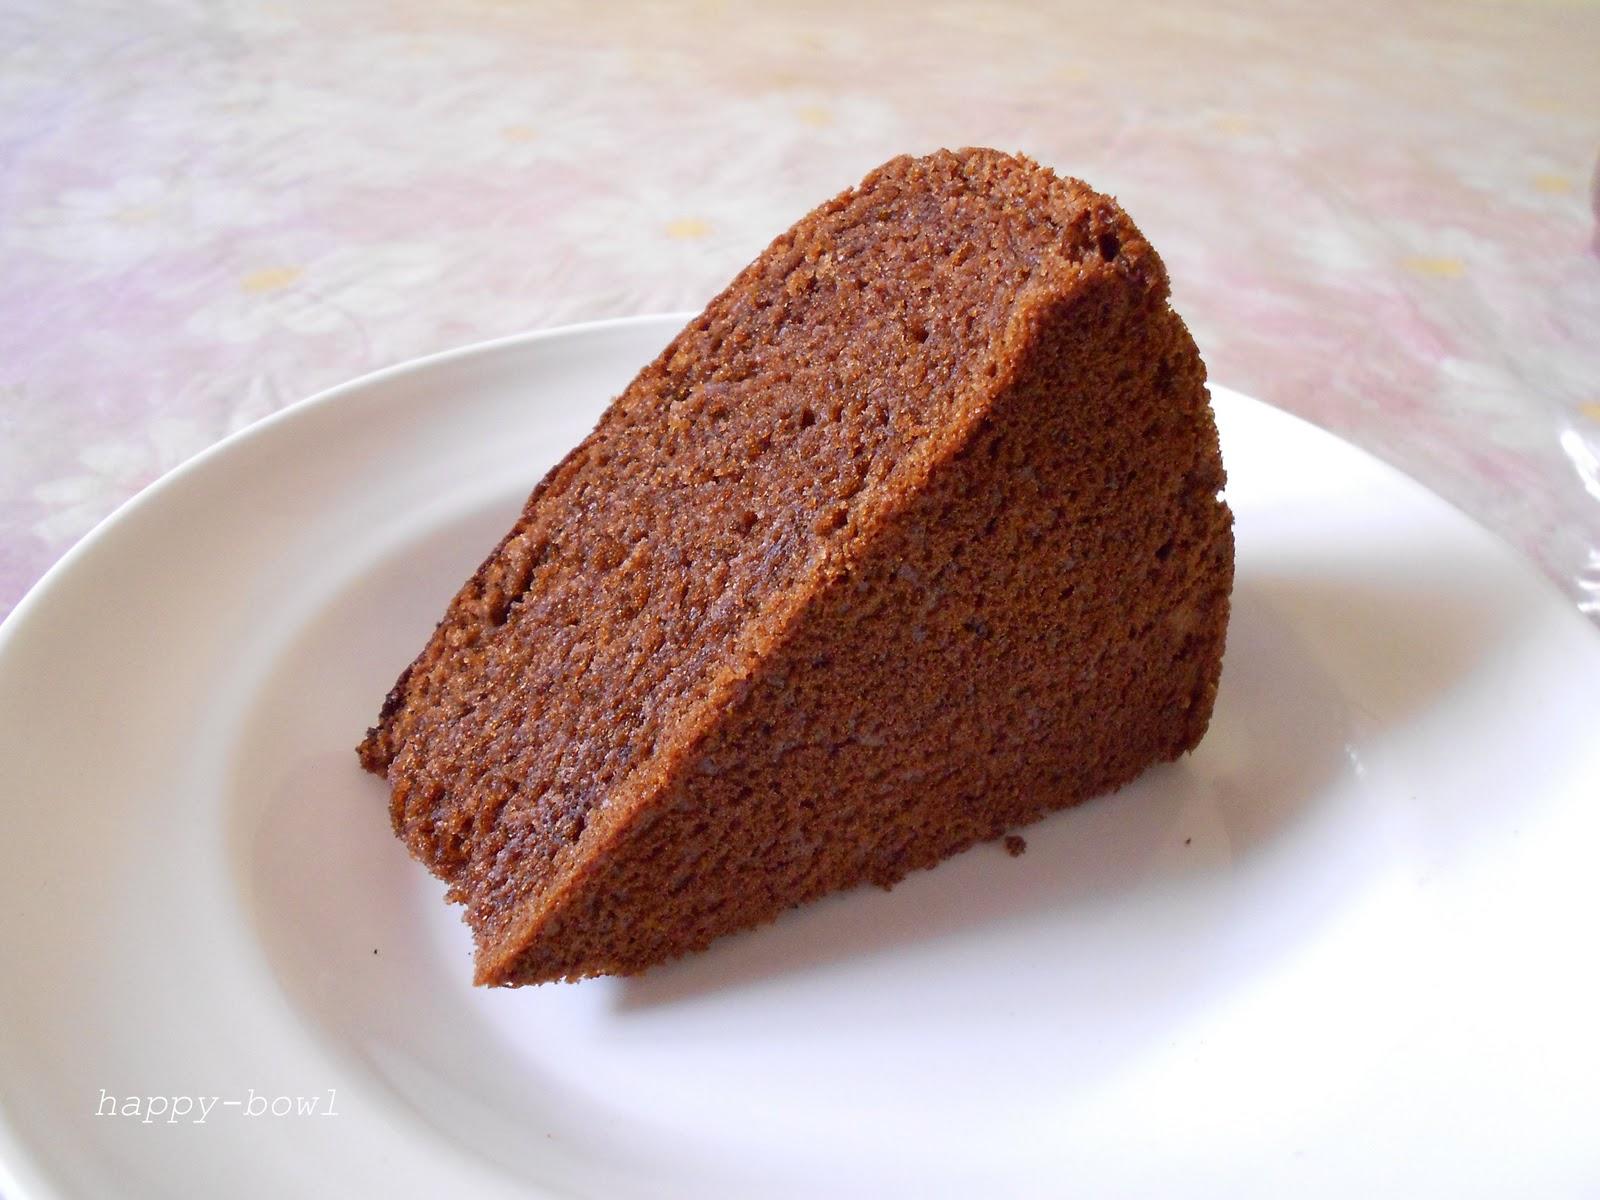 Eggless Chocolate Cake Images : happybowl: EGGLESS CHOCOLATE CAKE